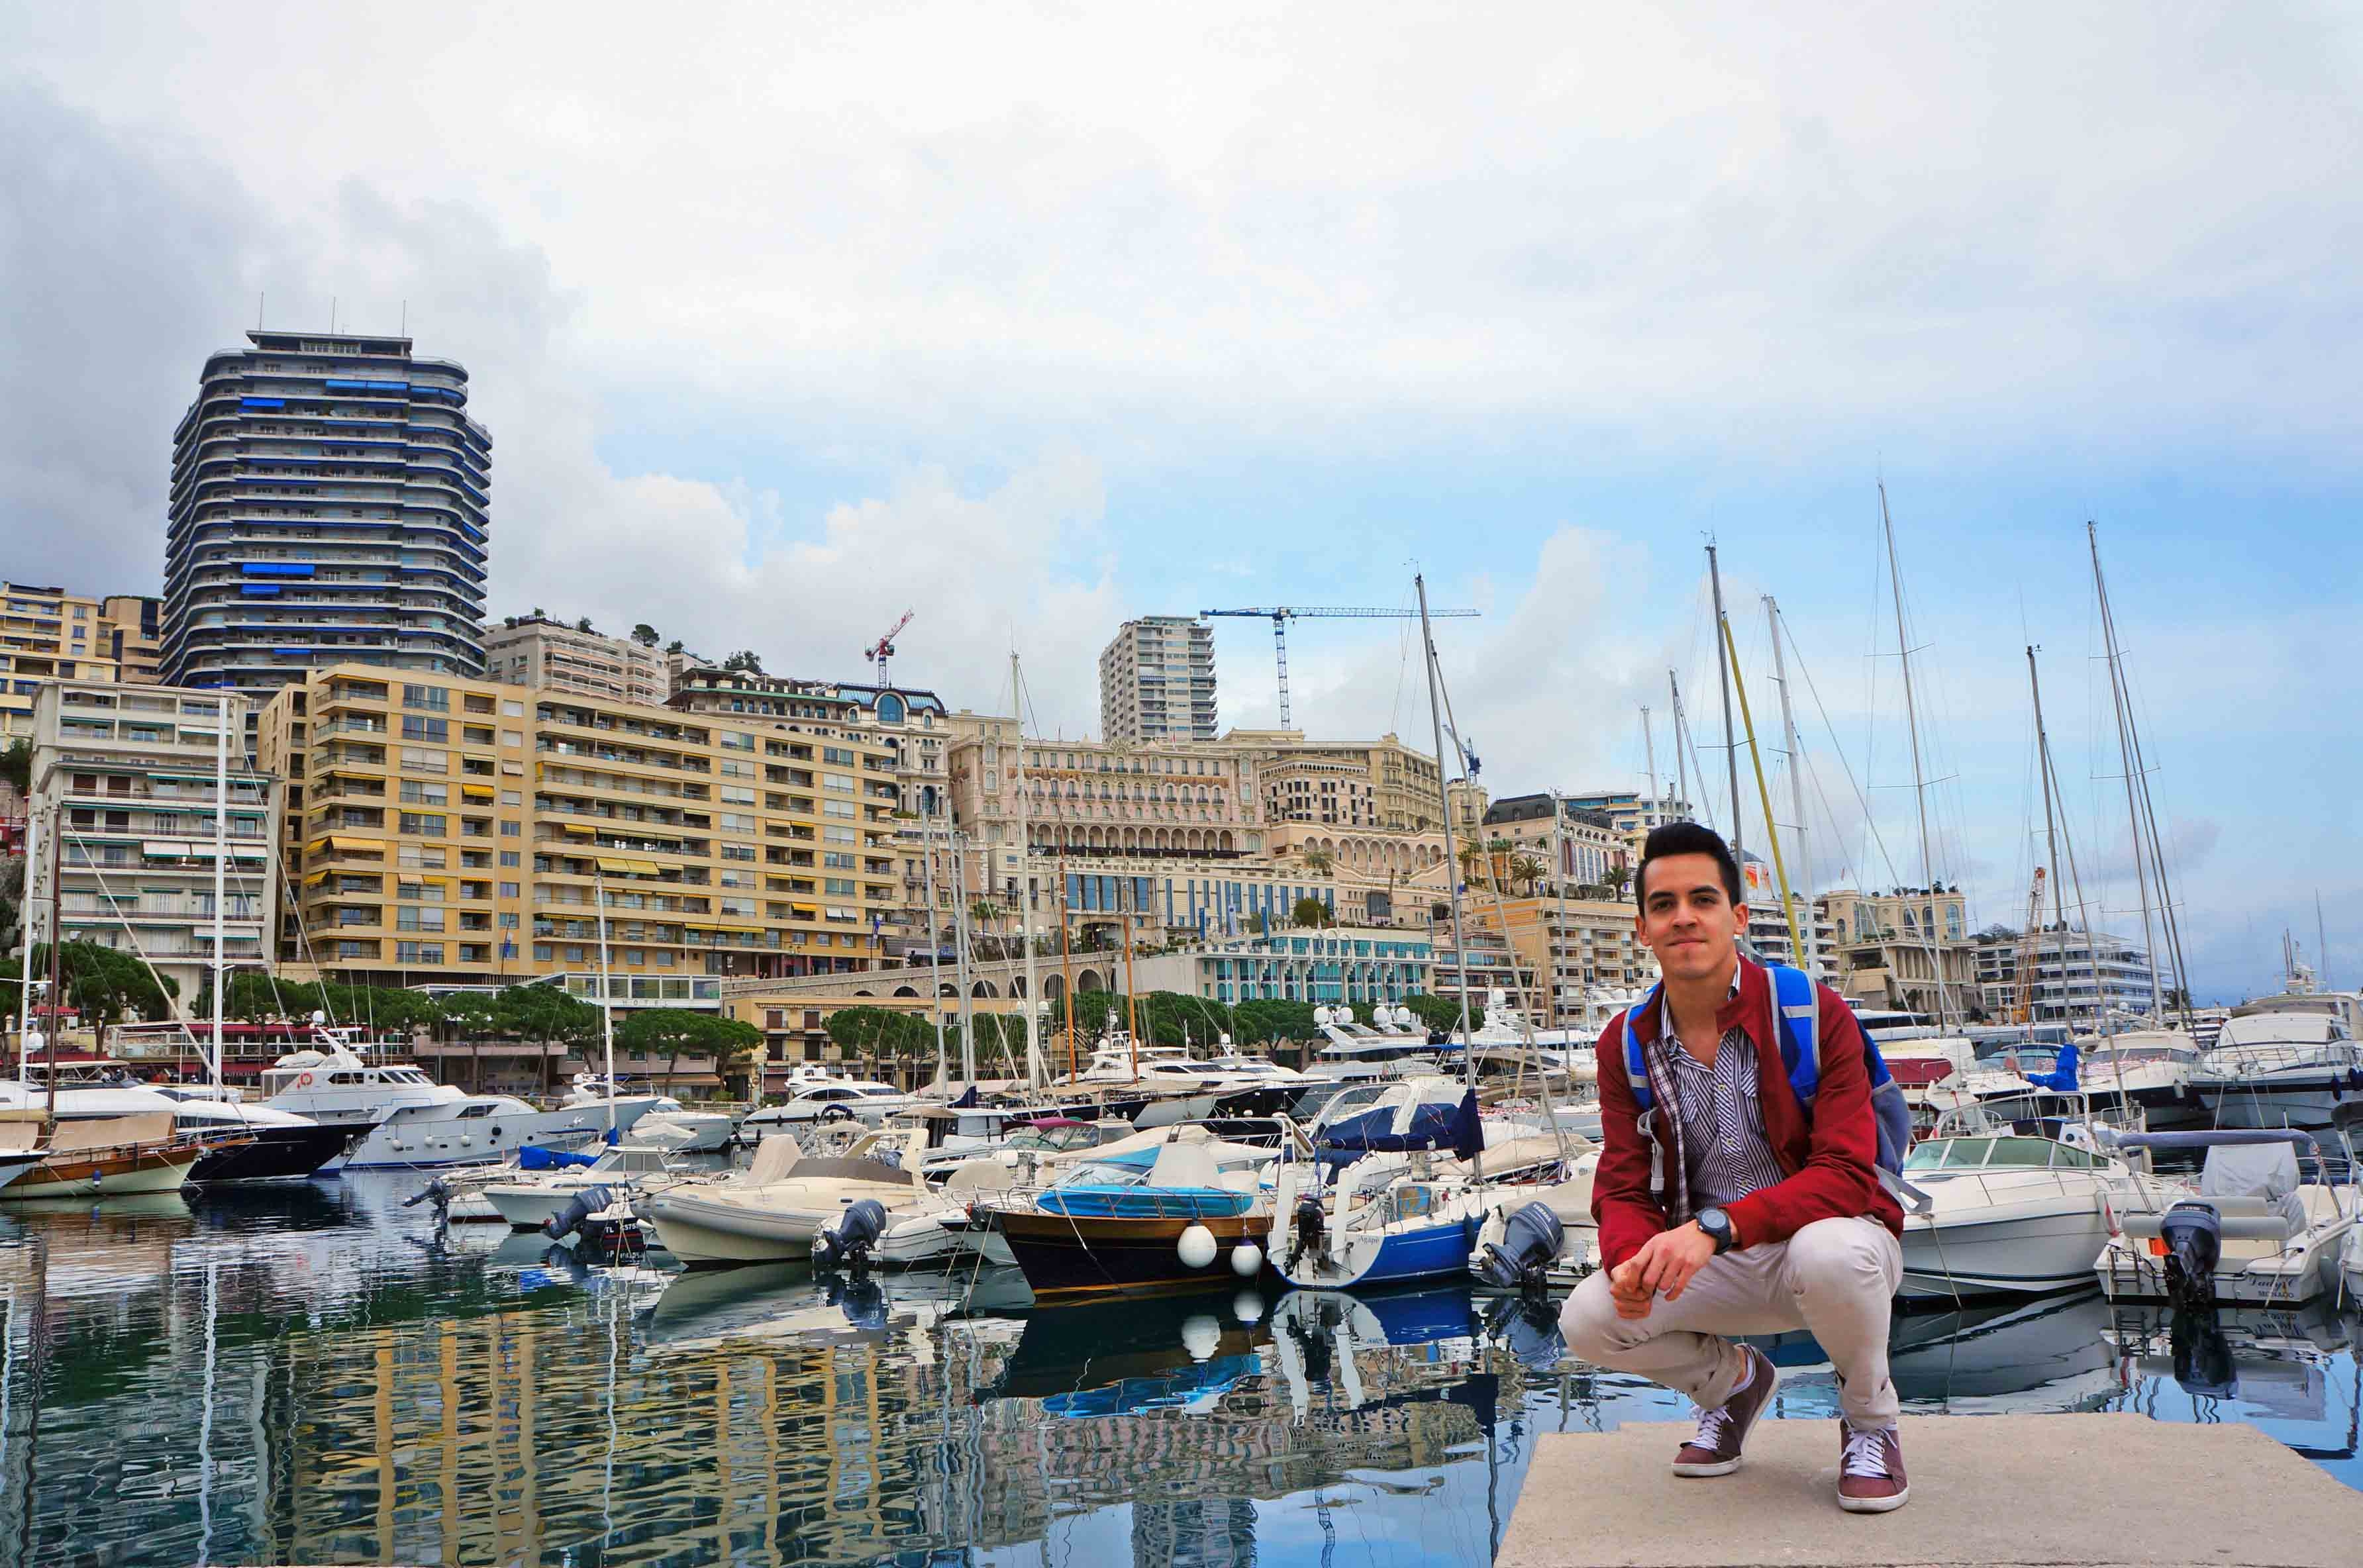 Mónaco, 2 km² de glamour